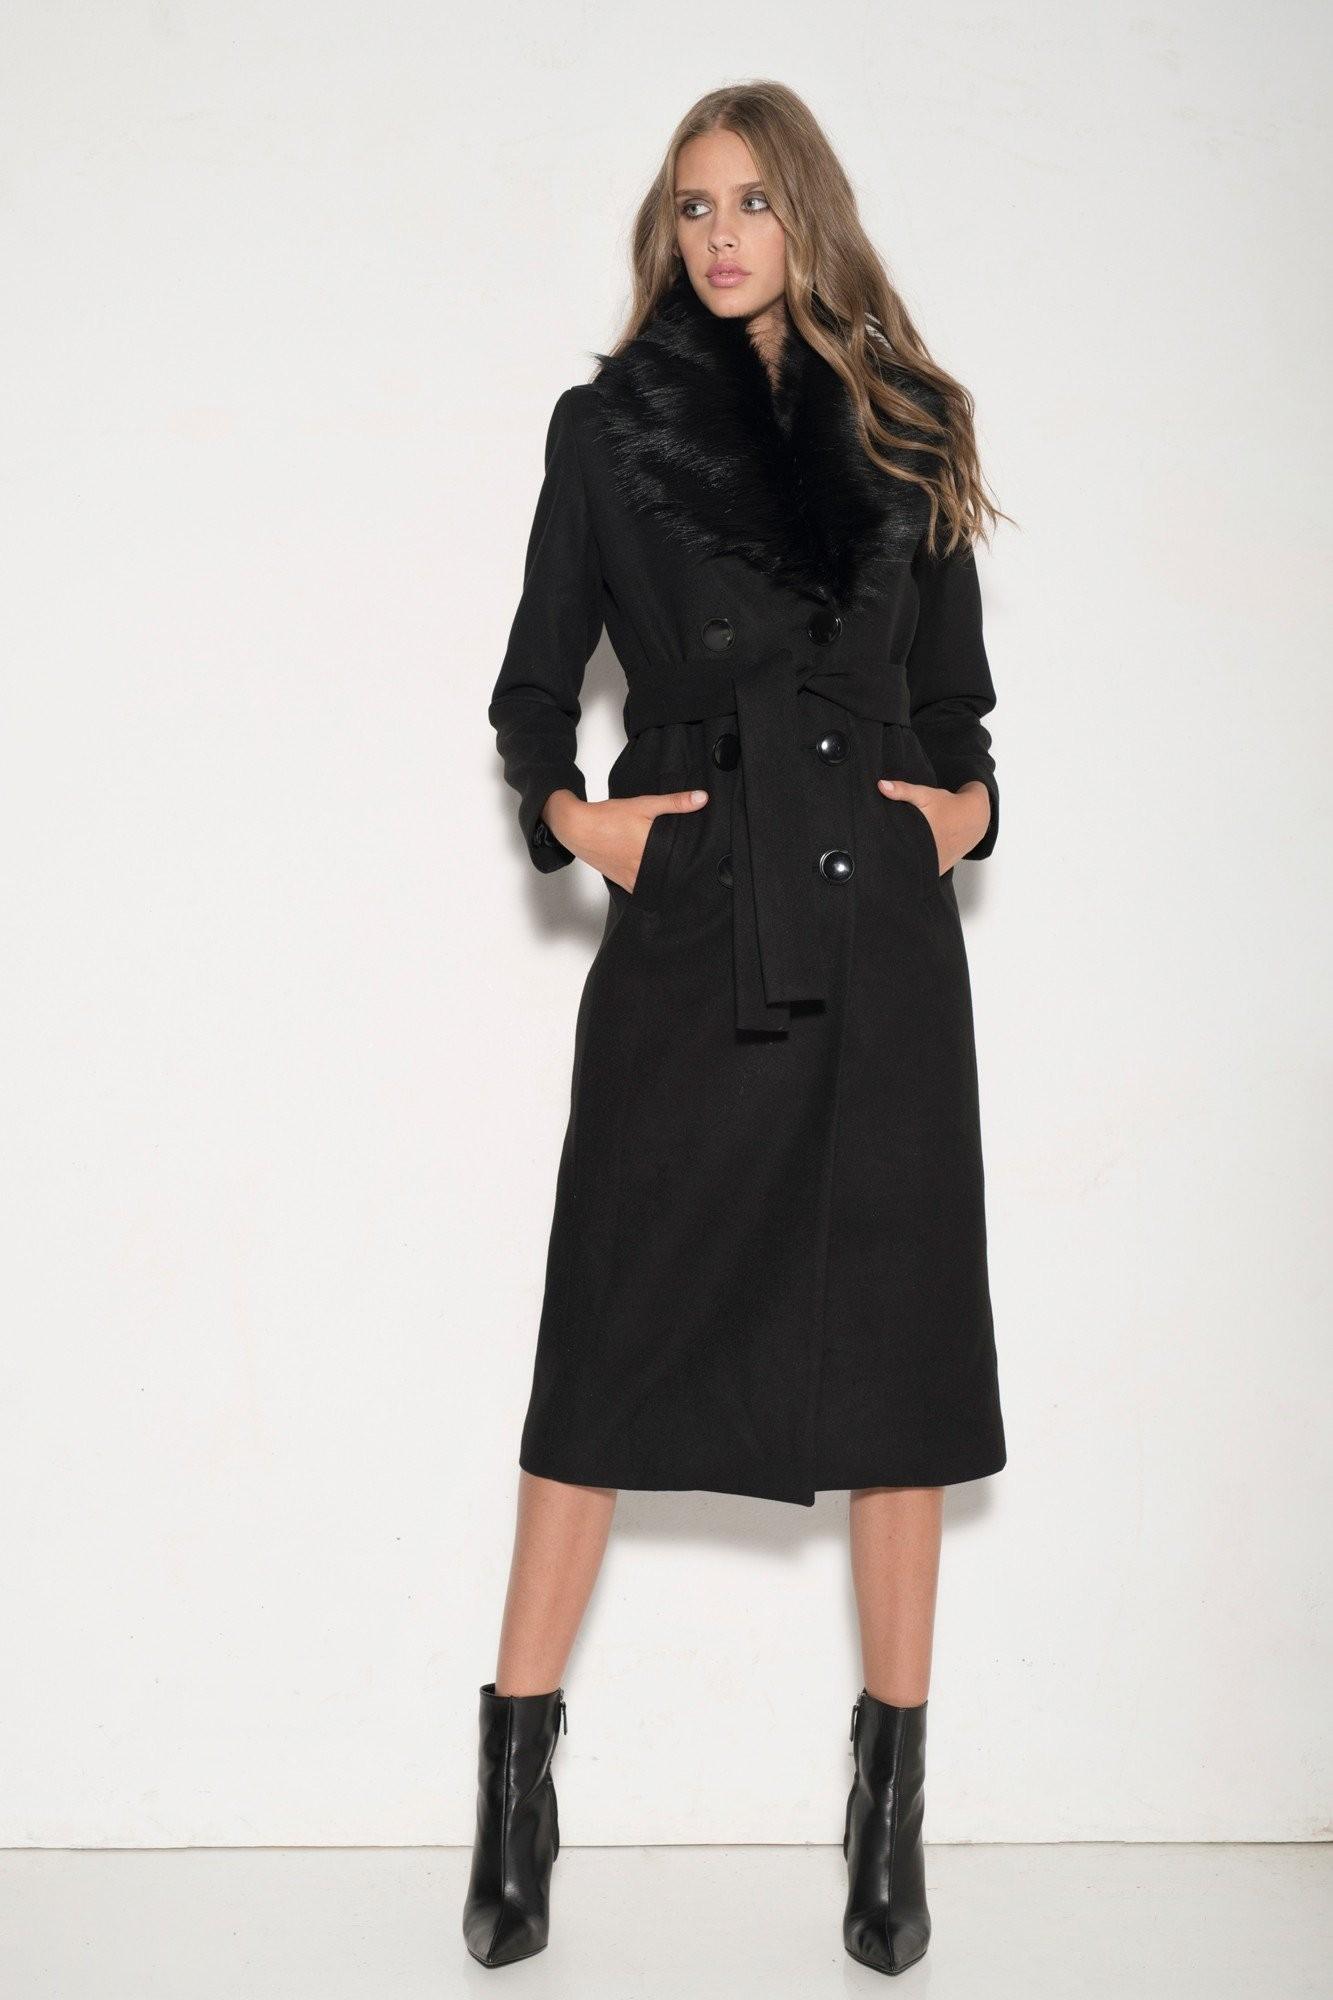 coat-anna.jpg (1333×2000)